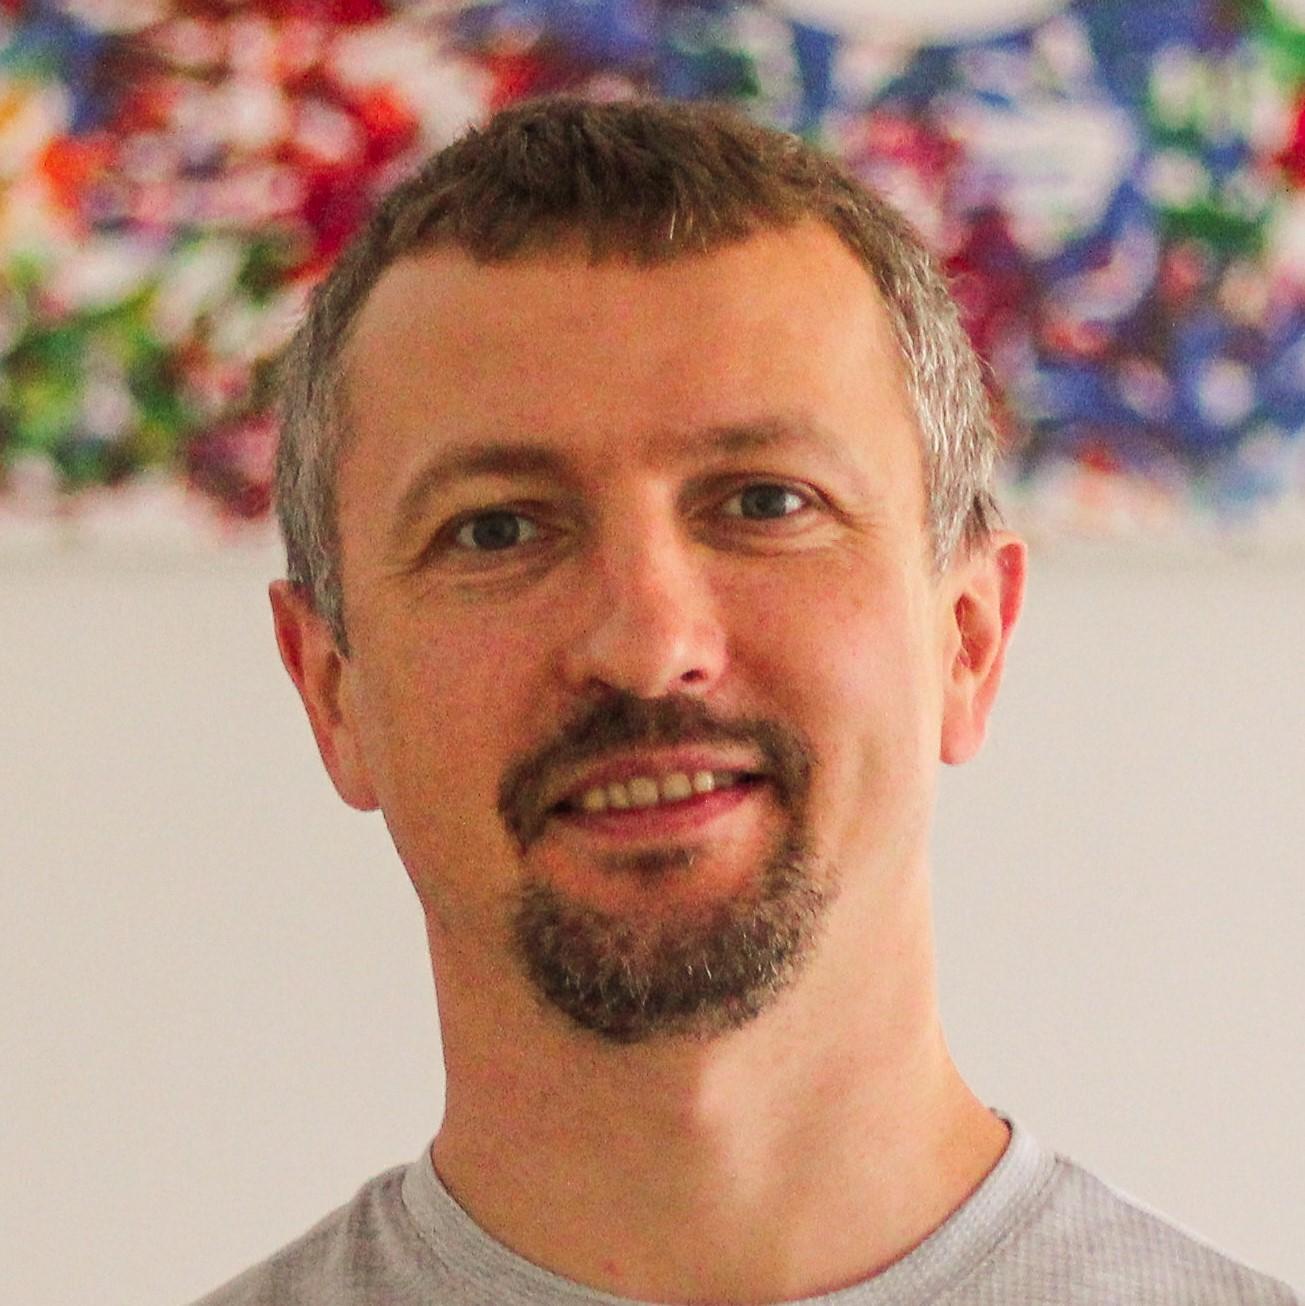 OntargIT_expert_Oleksandr_Krutiy